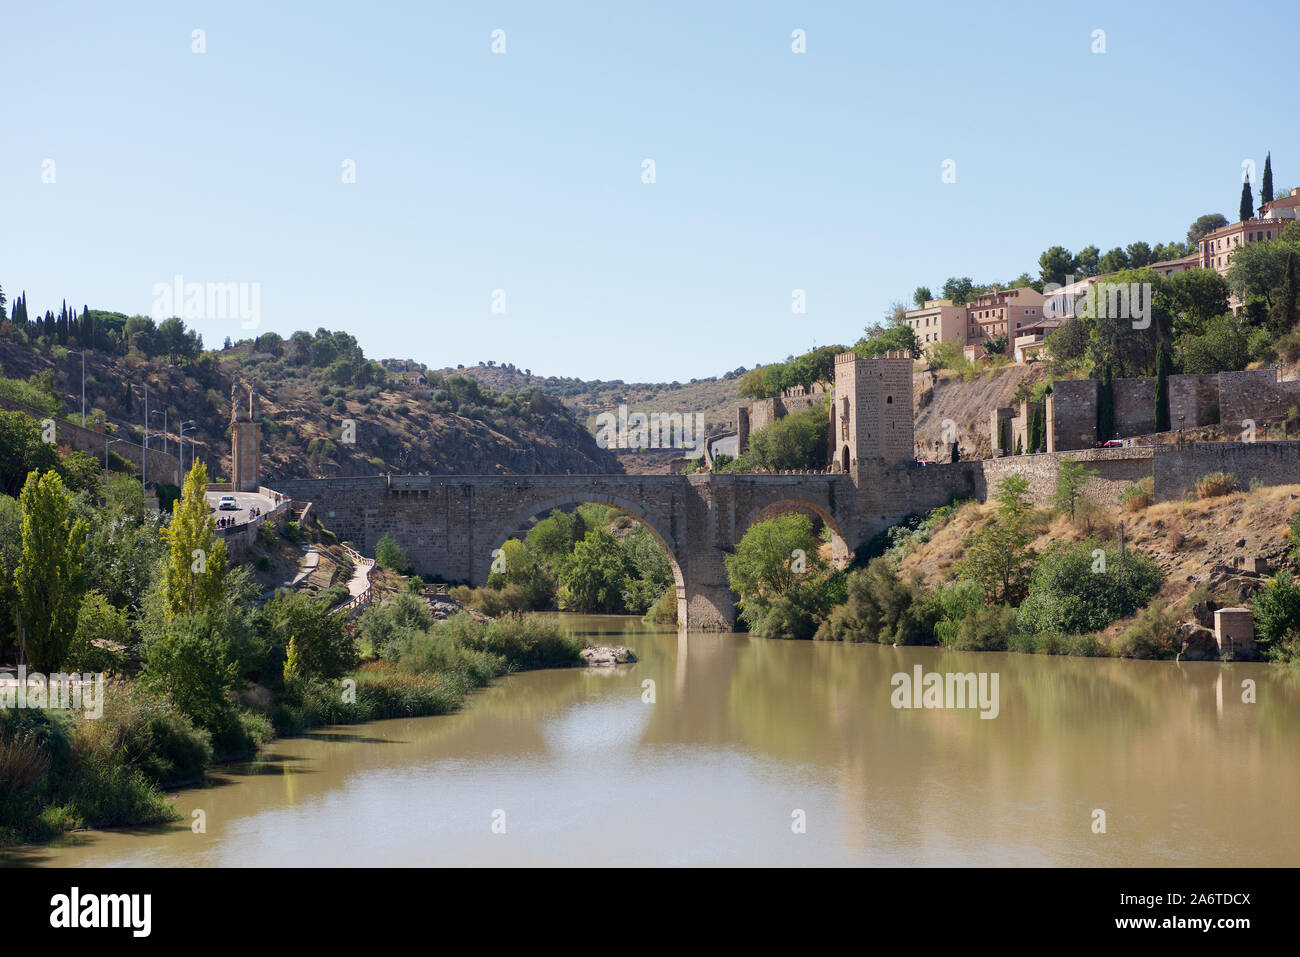 The Puente de Alcántara over the Tagus River in Toledo in Spain Stock Photo